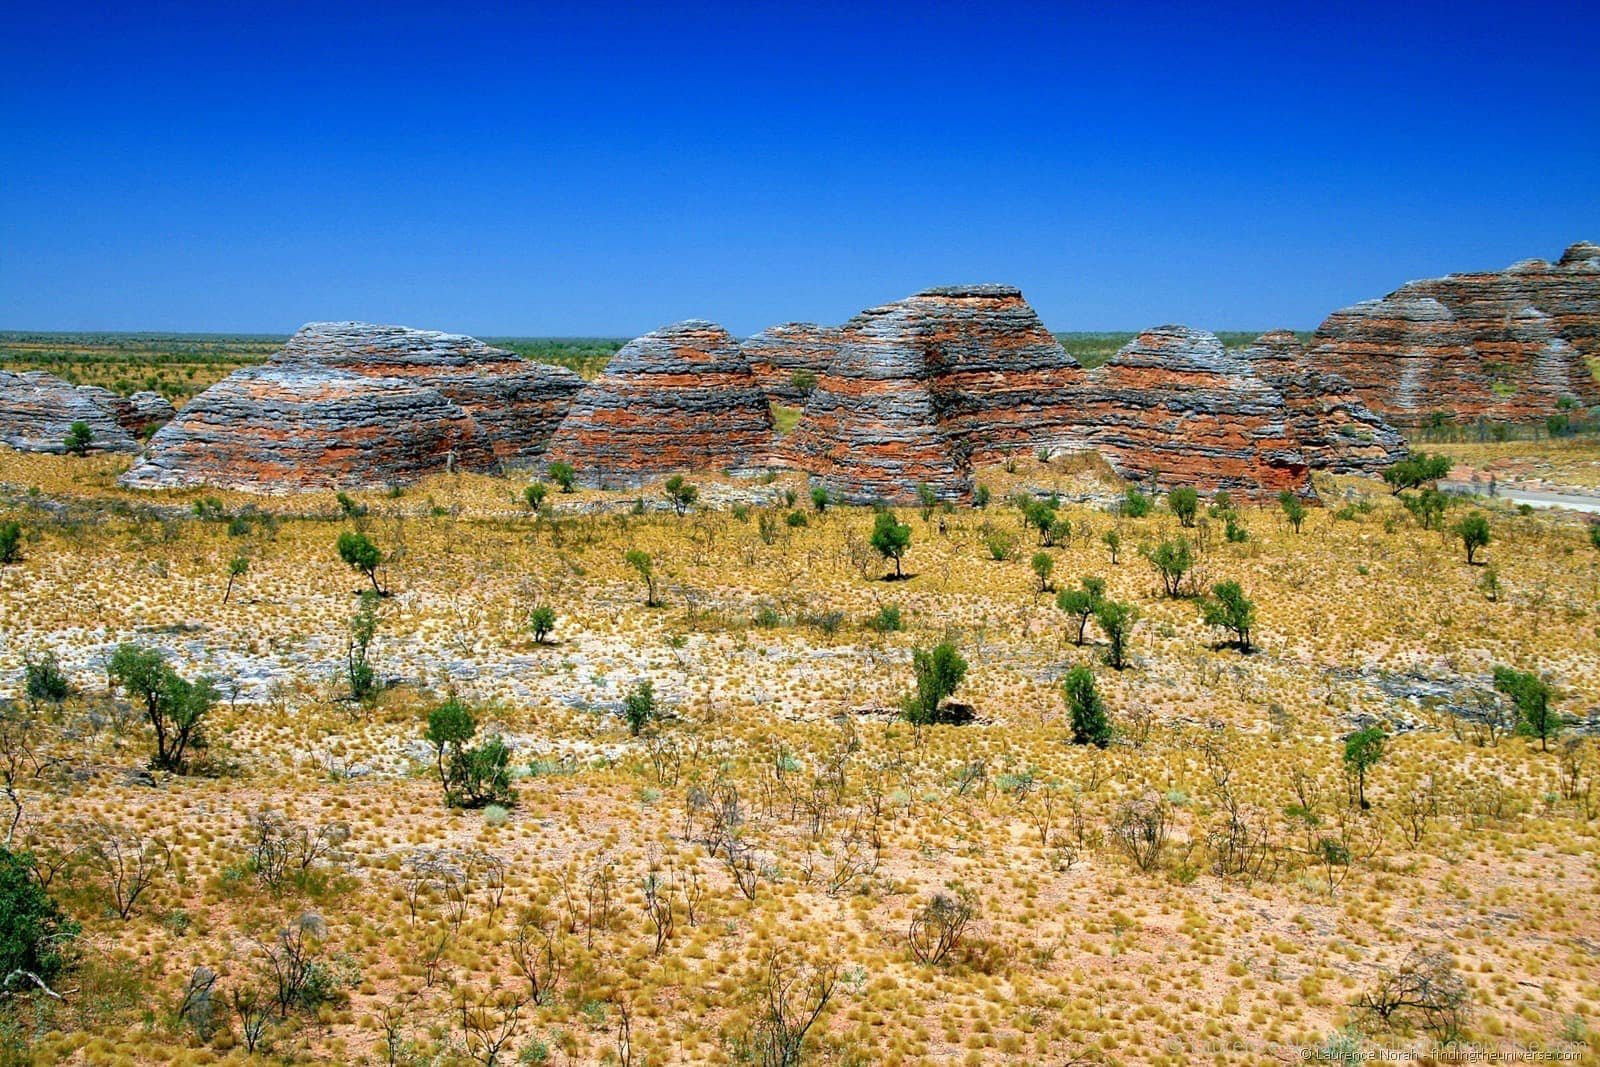 Purnululu bungle bungle rock formation scaled - tresorit@lnorah.co.uk's conflict 07.01.2014_15.24.35